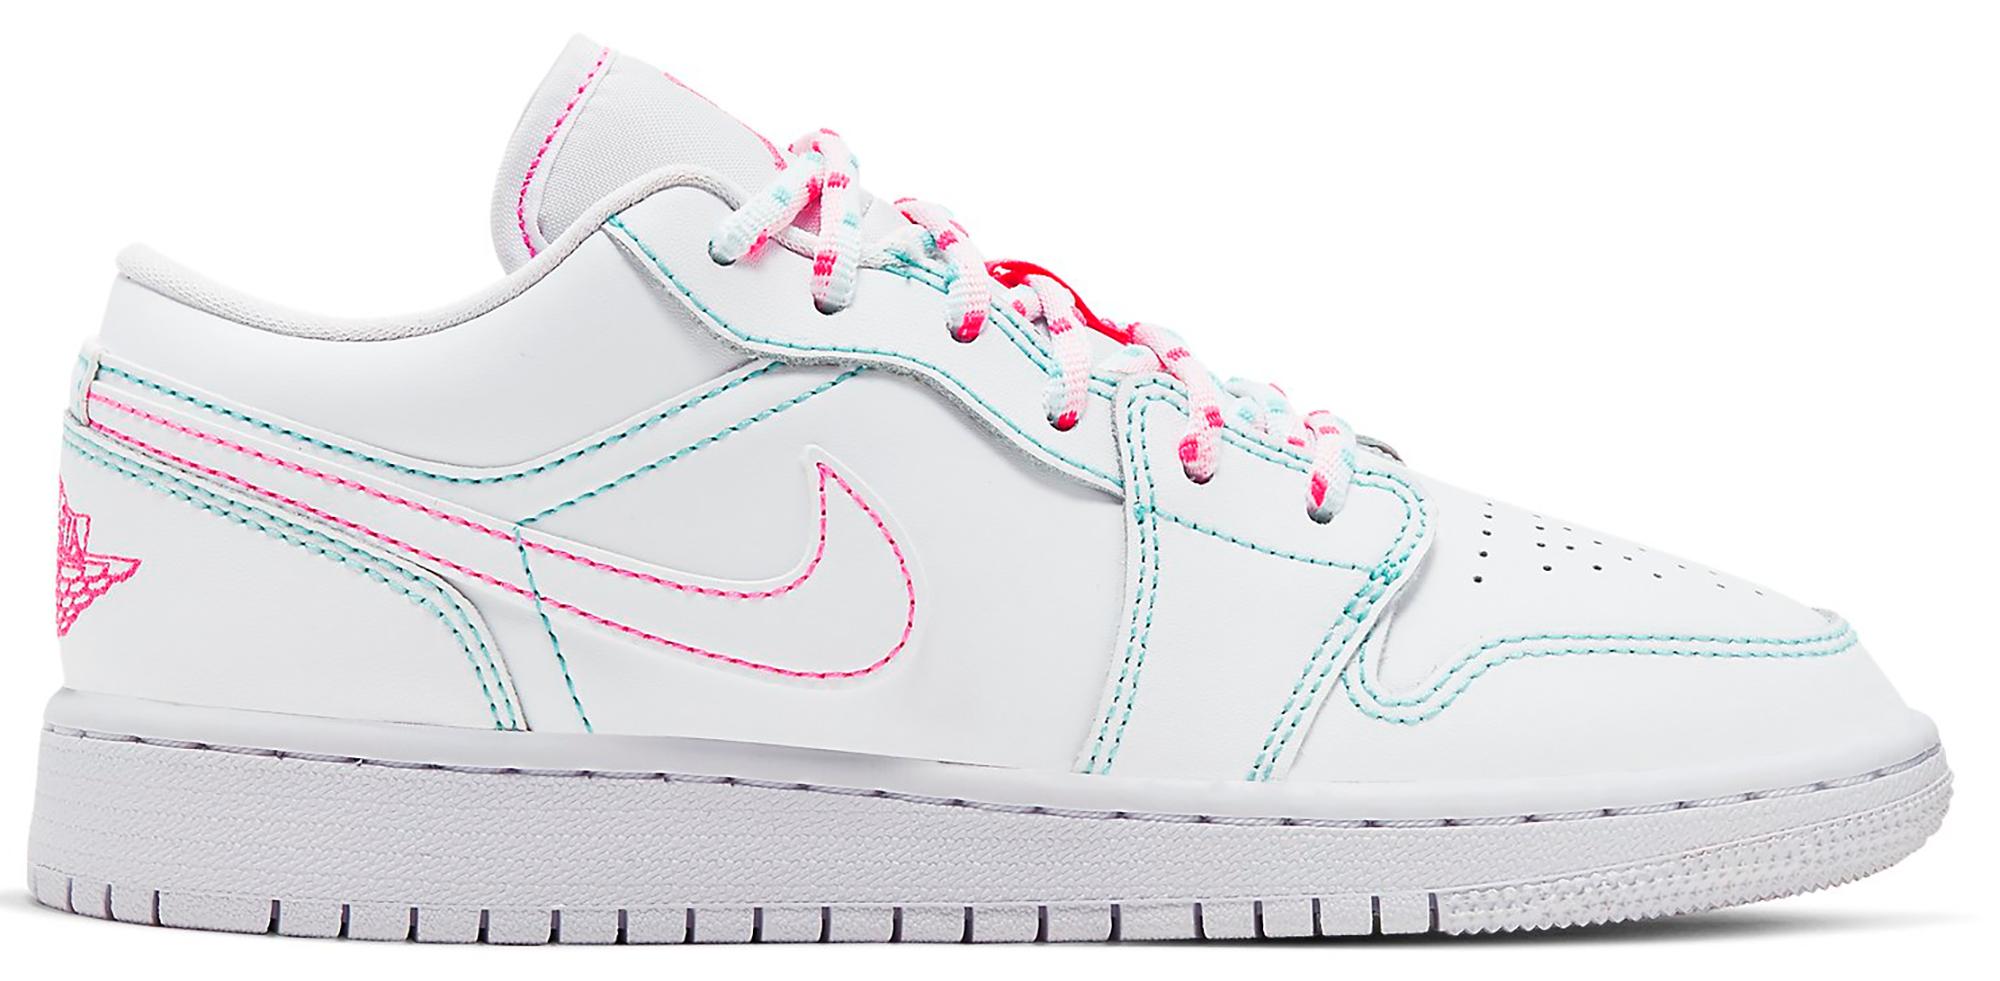 light pink and white jordans